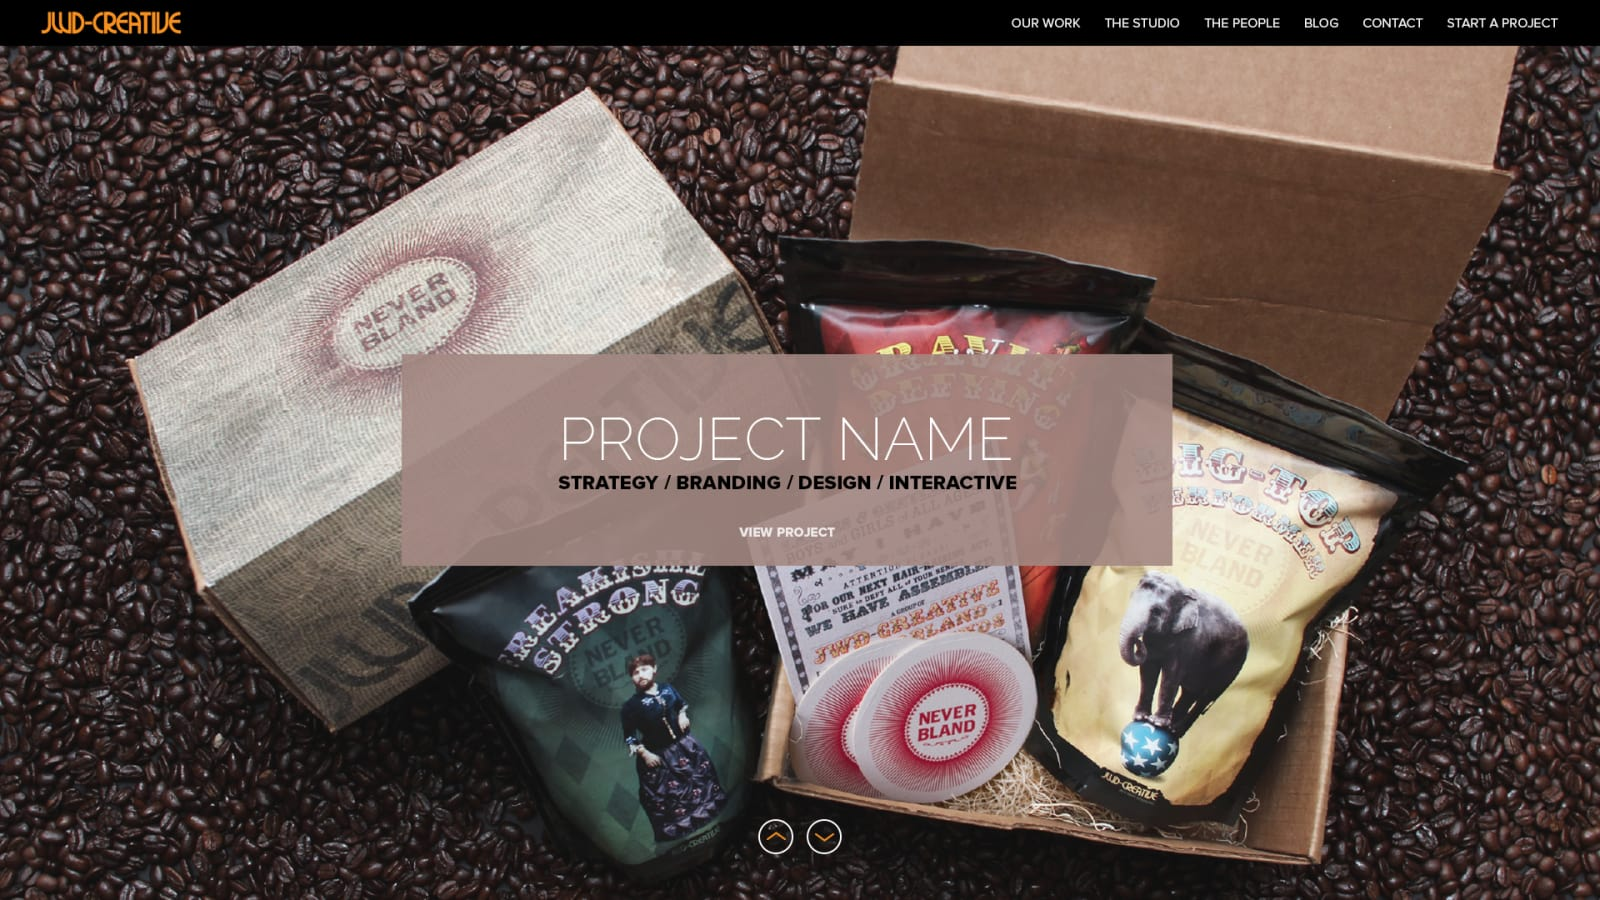 JWD Creative Home Page